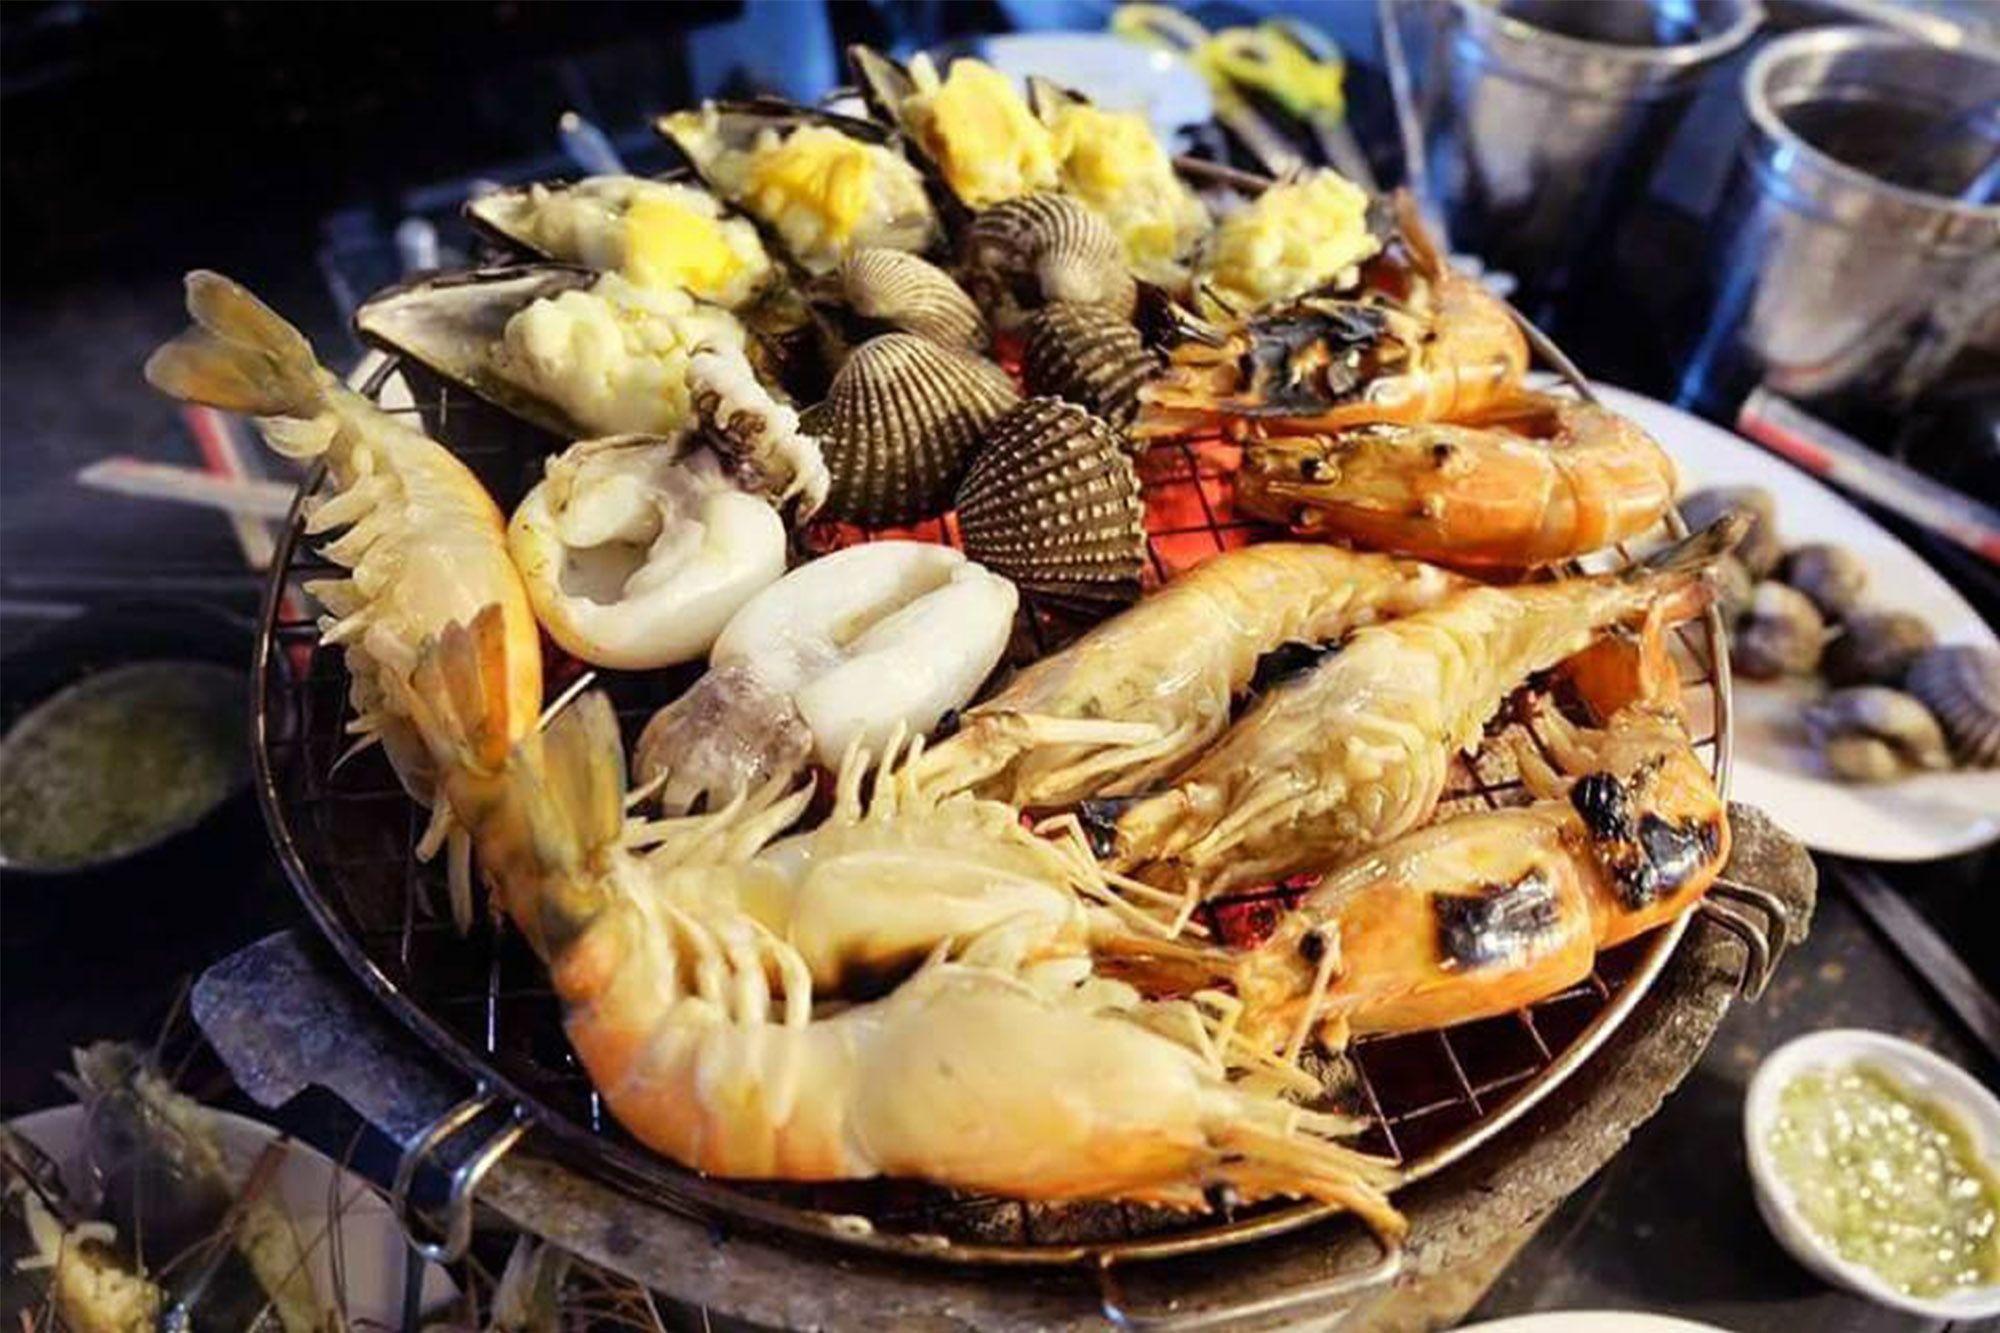 Taikong Seafood Buffet Jatujak 曼谷流水蝦 洽圖洽店 曼谷流水蝦海鮮燒烤 分店 曼谷 Taikong Seafood 曼谷 流水蝦燒烤